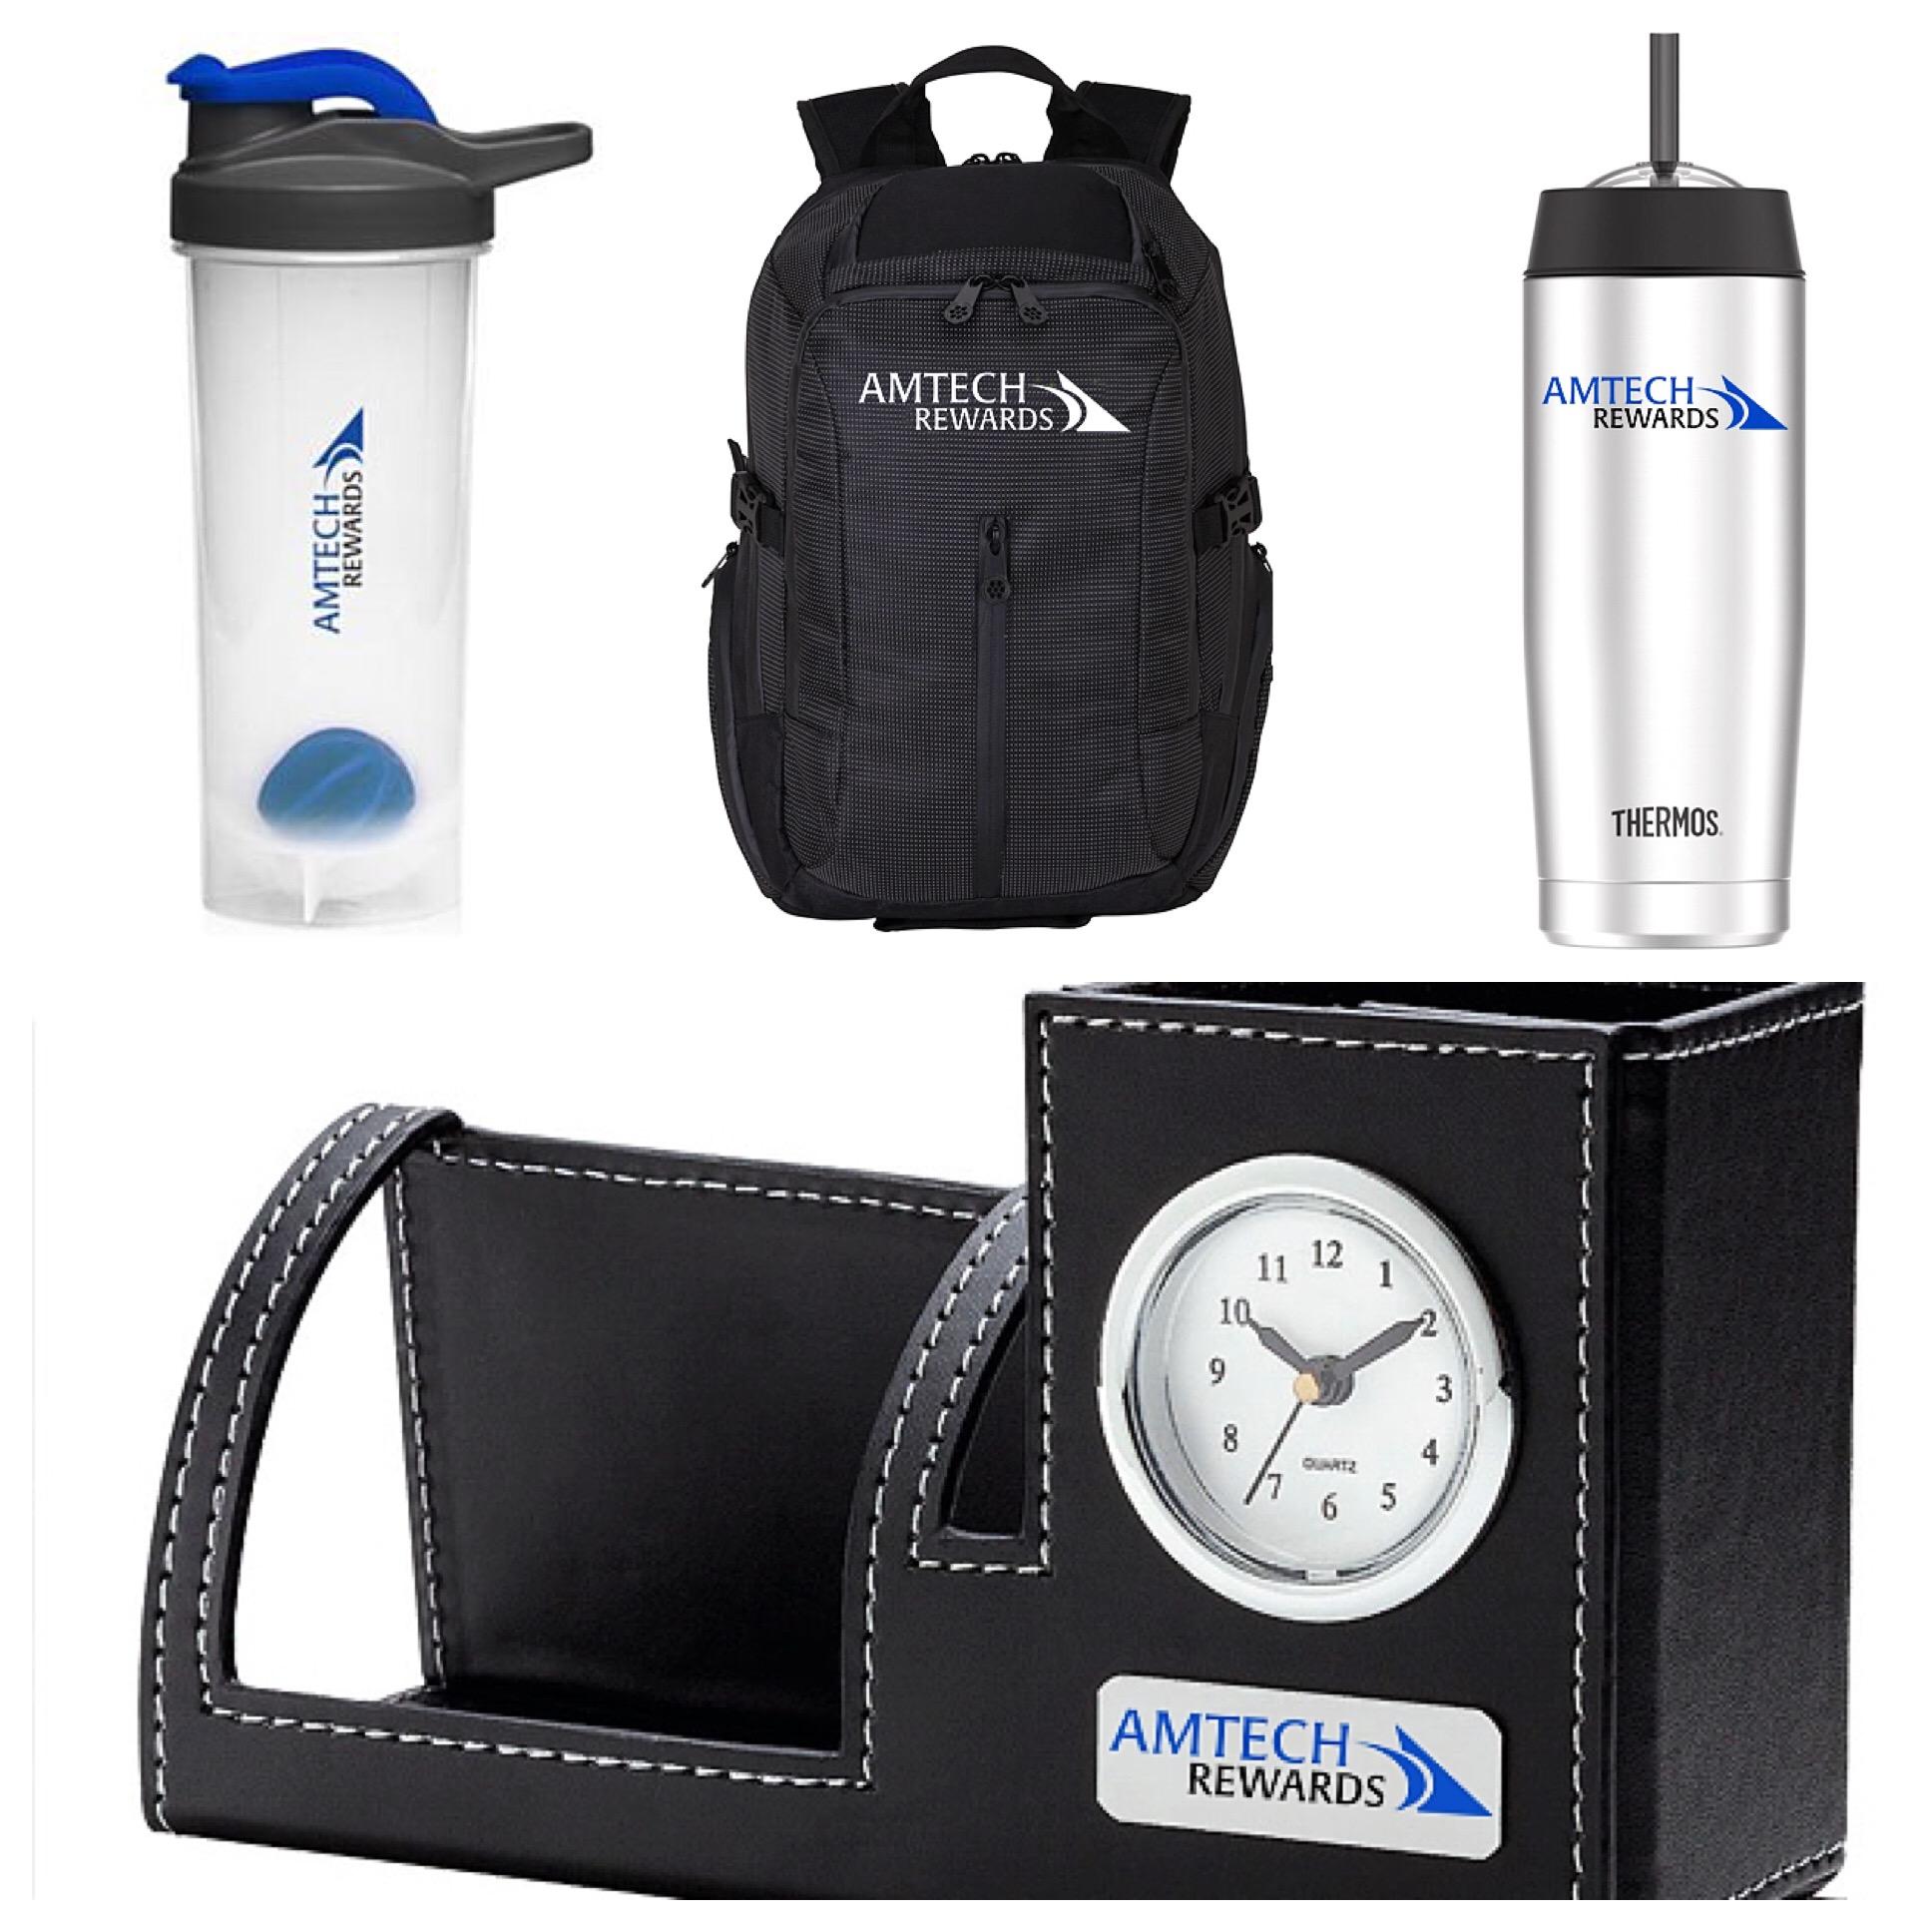 Amtech Rewards